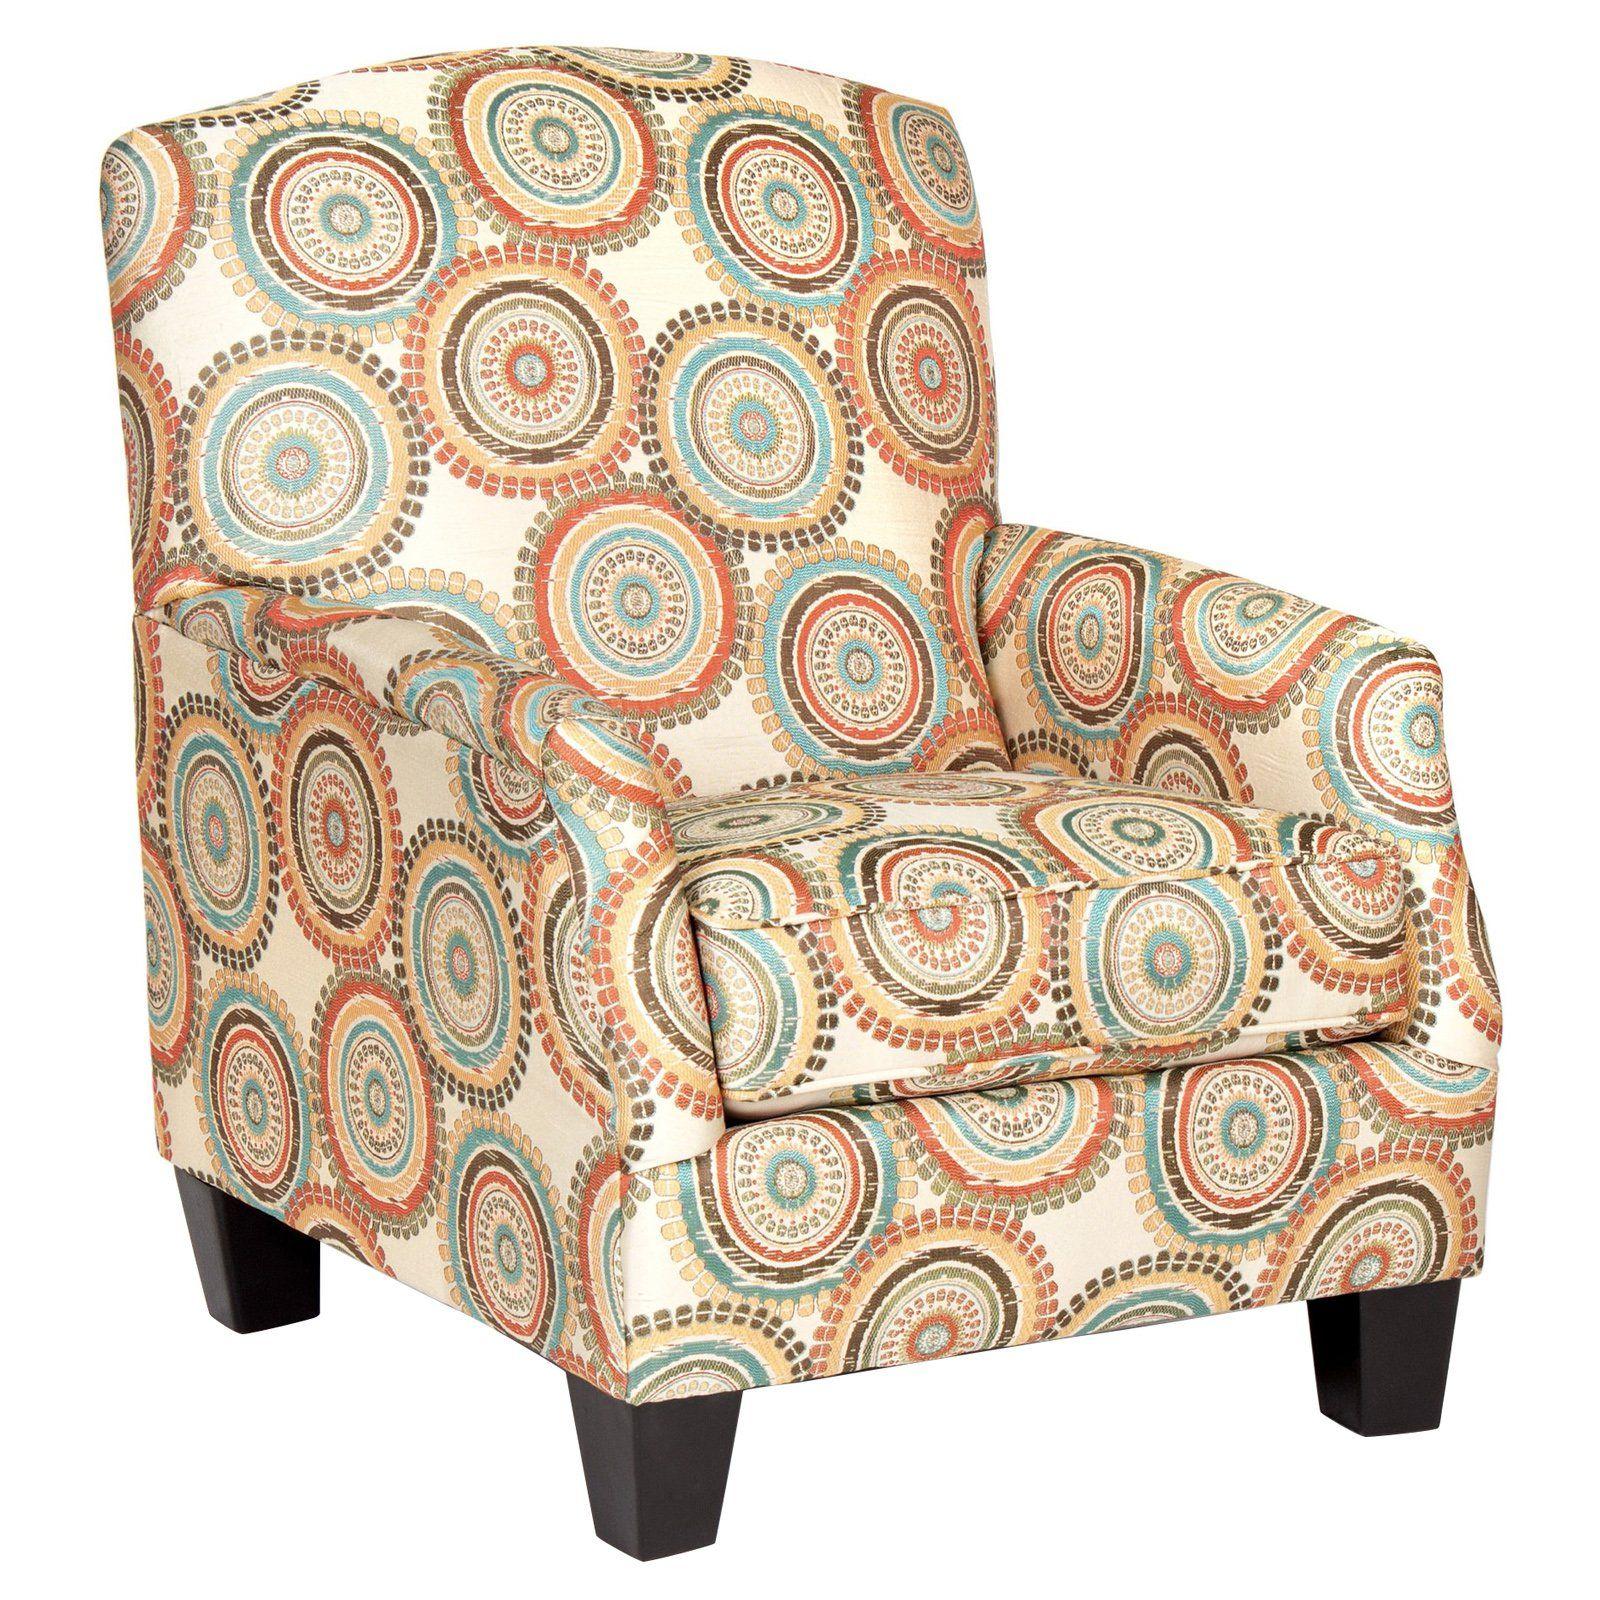 Chelsea Home Furniture Gill Chair Incognito Fiesta Furniture